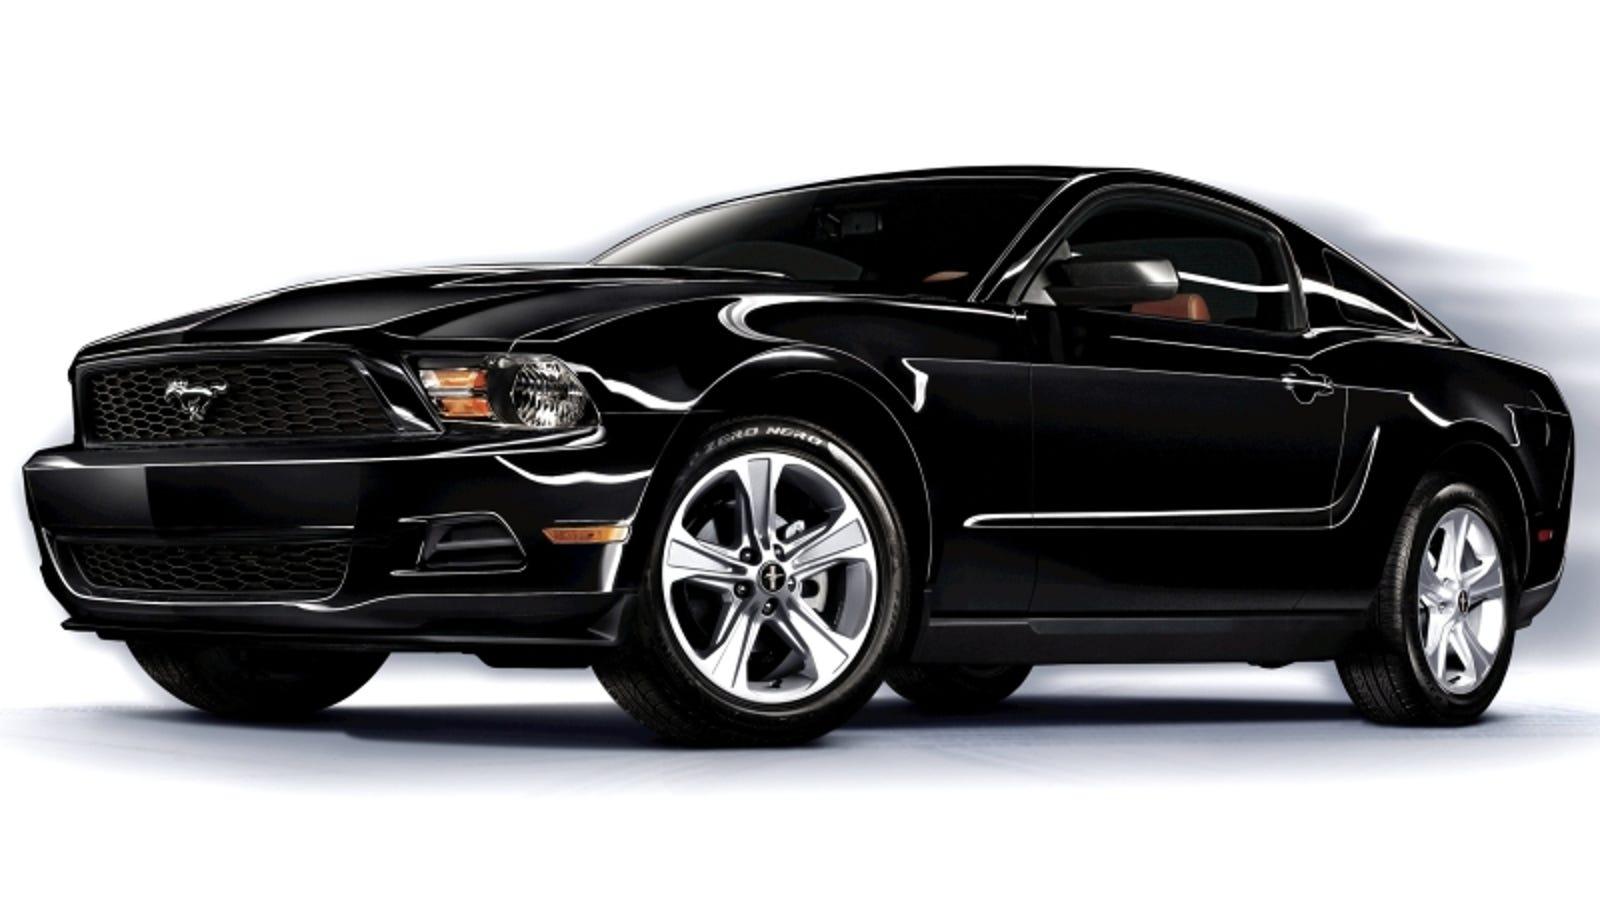 2011 Ford Mustang Gets New 305 Hp V6 30 Mpg Fuel Filter 2001